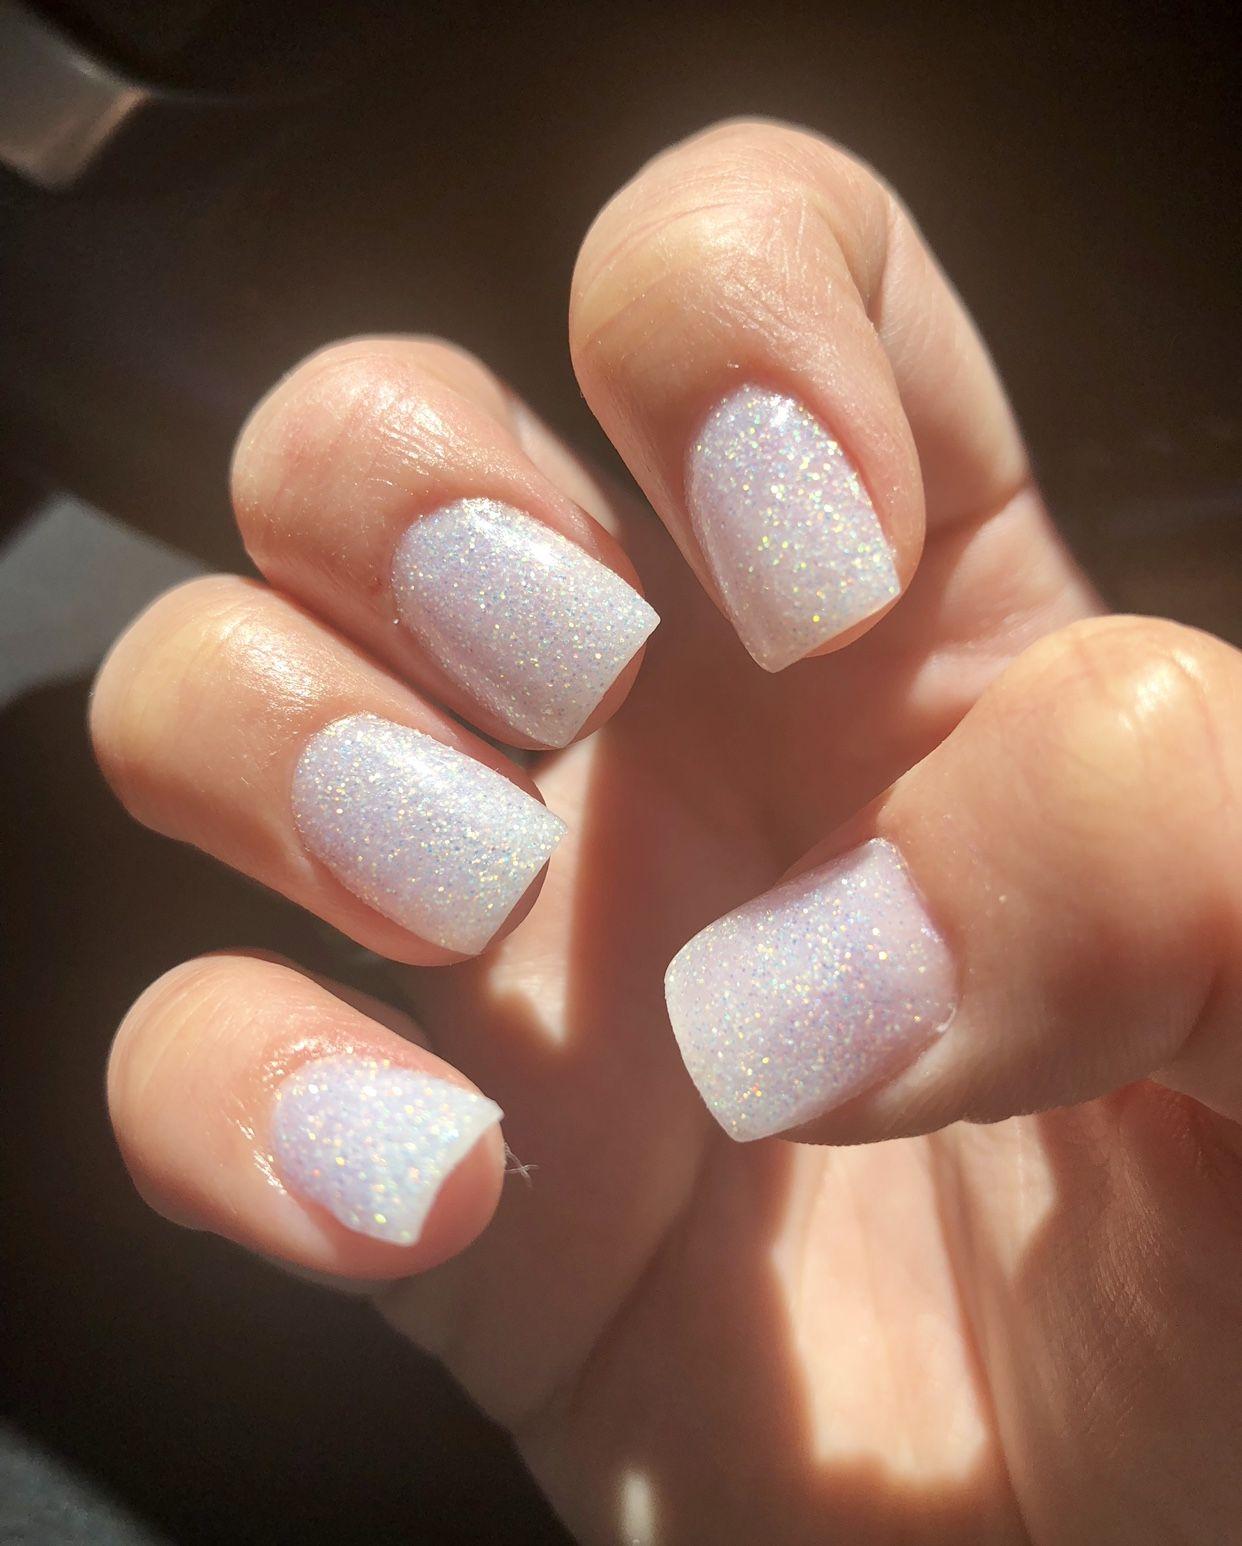 Sns Sparkle Nails Short And Square White Sparkle Nails White Glitter Nails Acrylic Nails Coffin Short